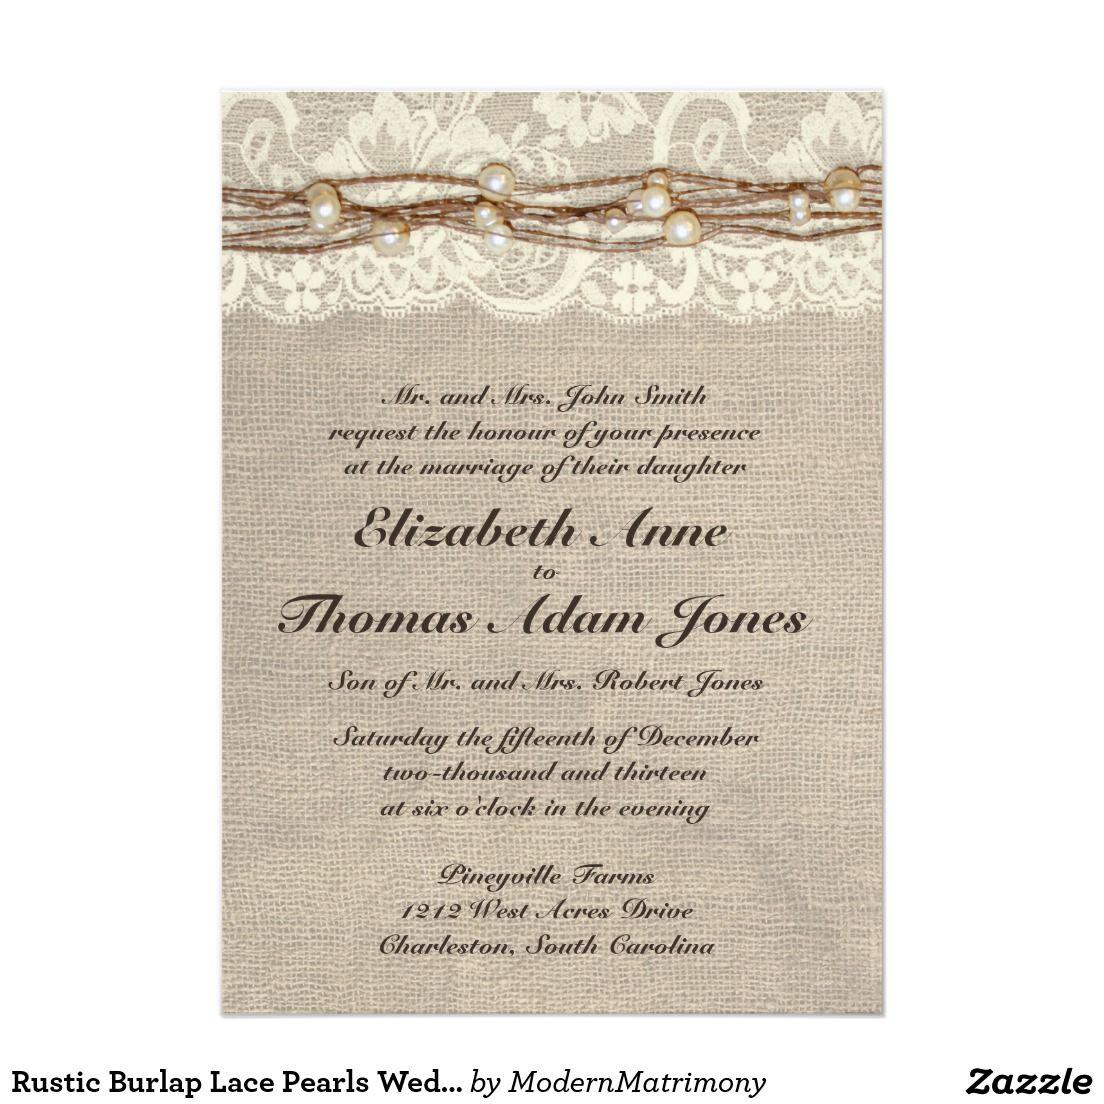 Rustic Burlap Lace Pearls Wedding Invitation | Burlap lace, Country ...